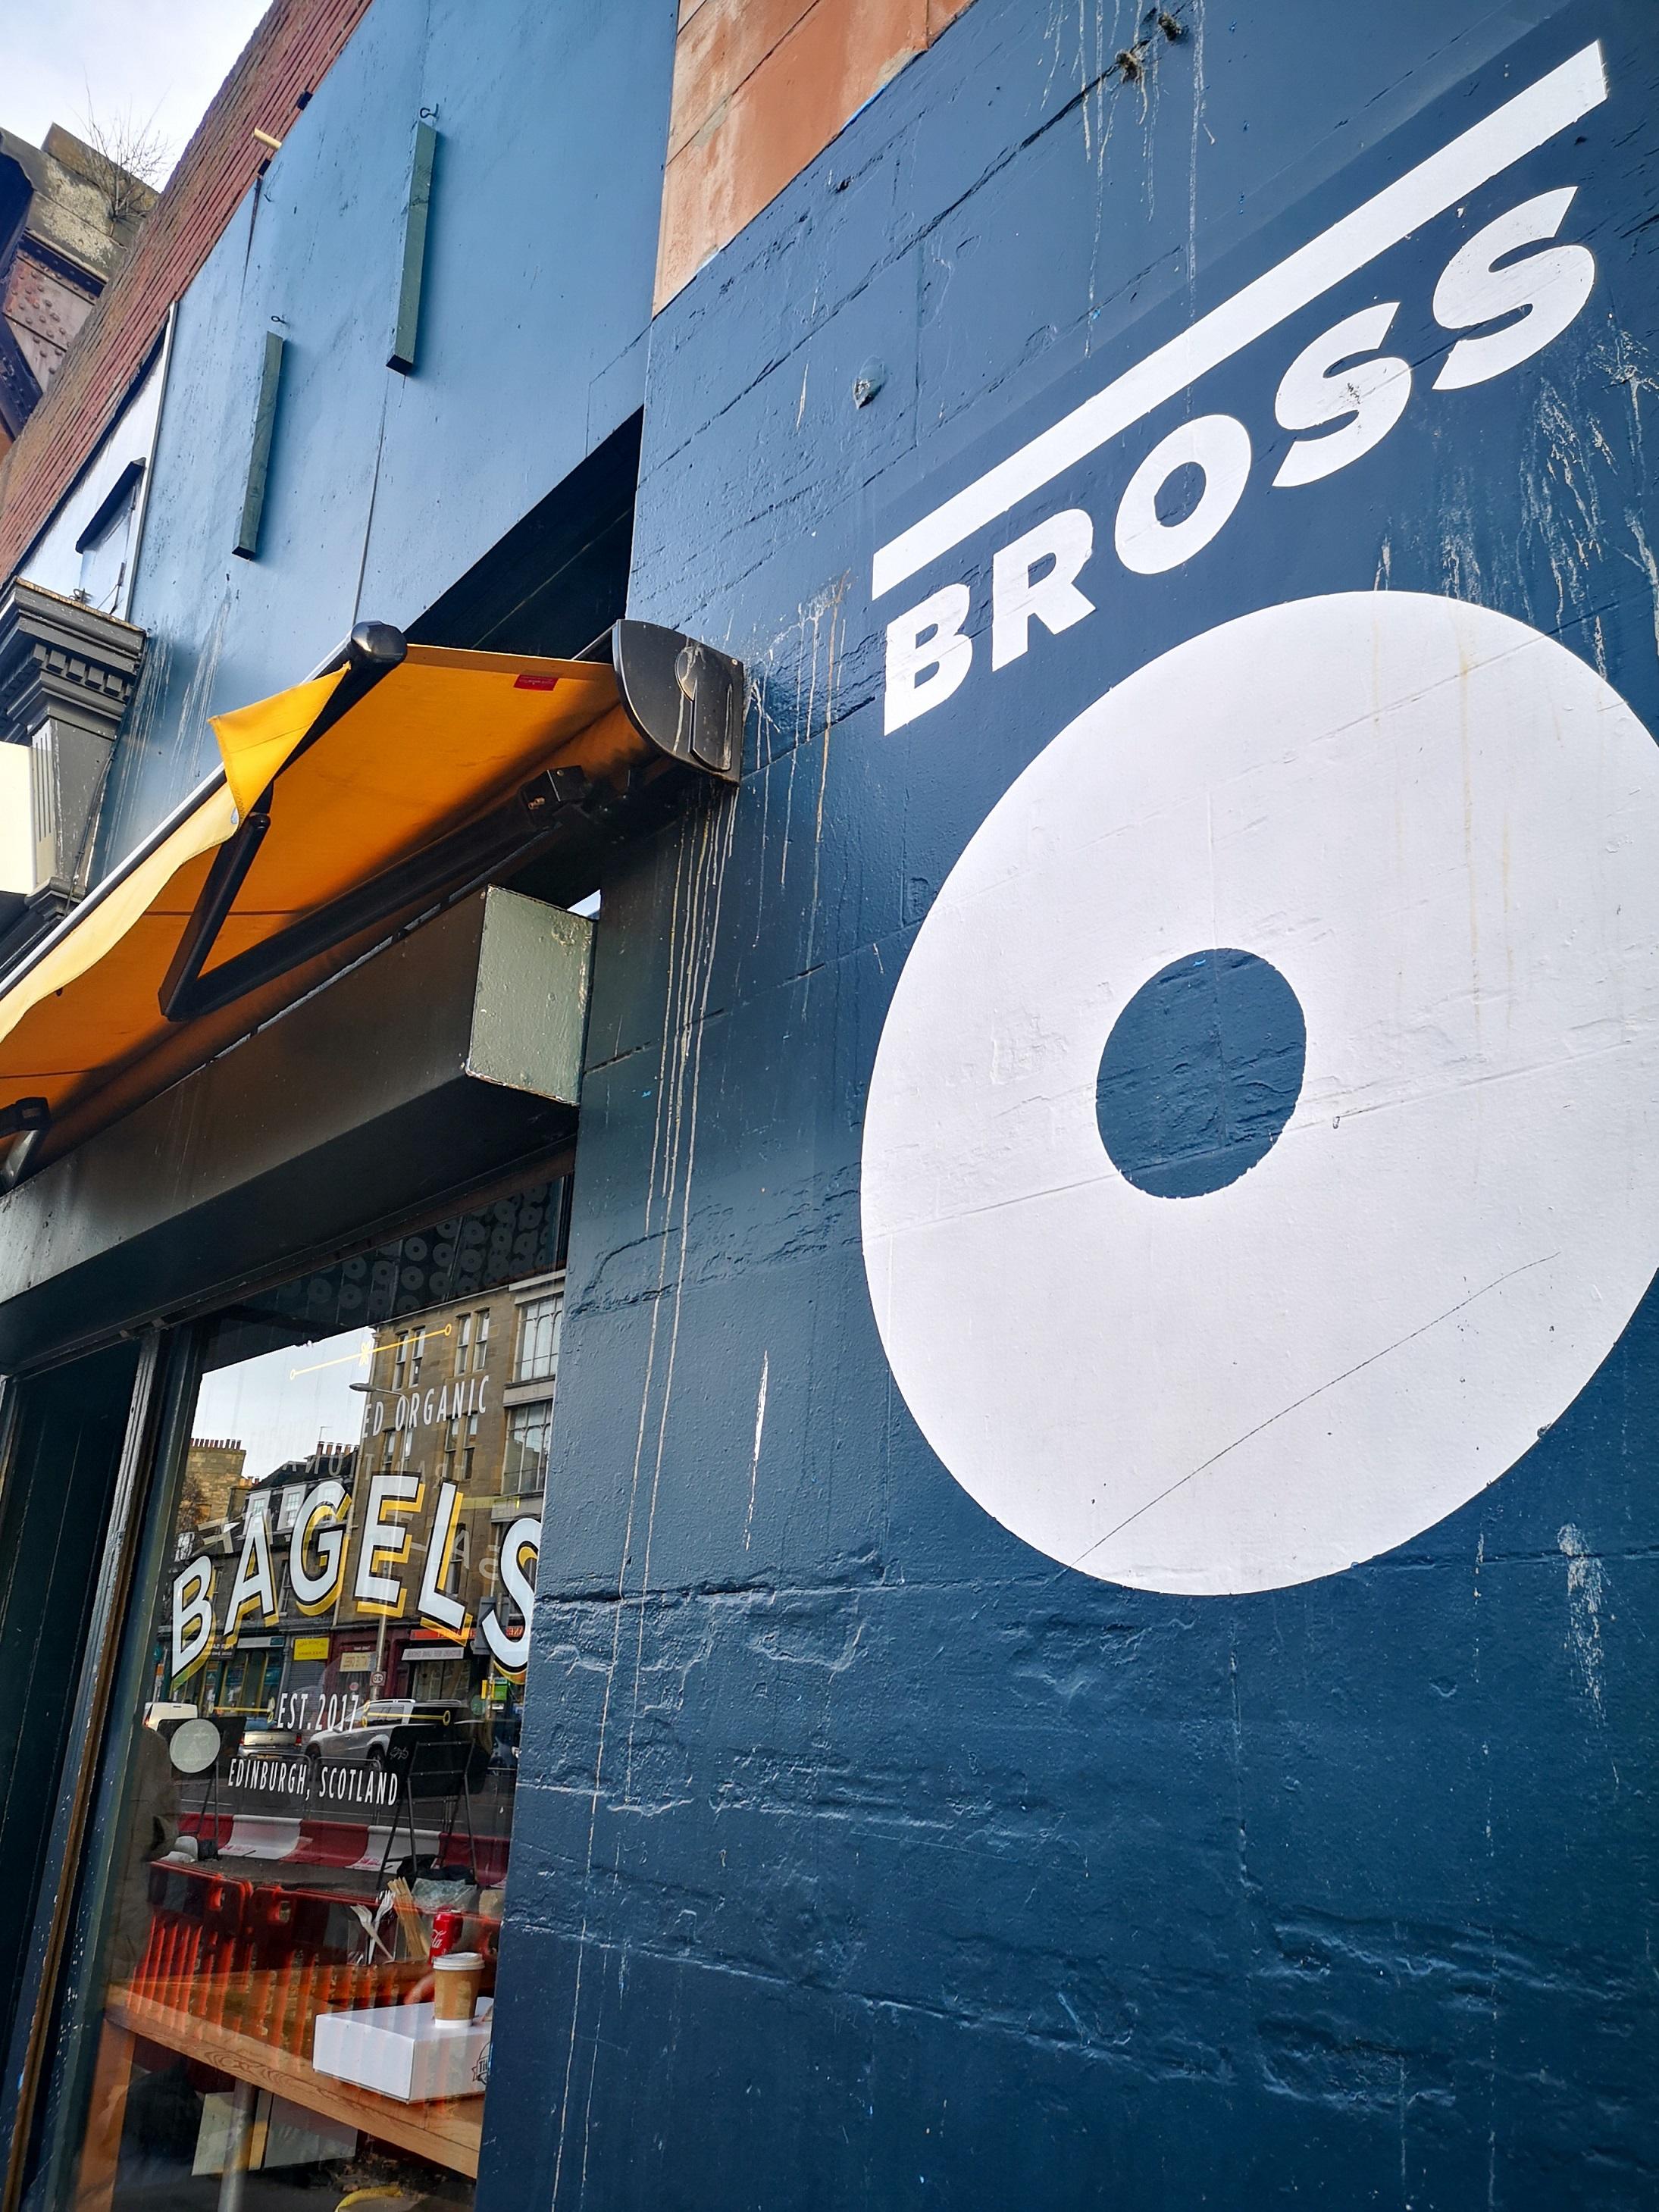 Bross brothers bagel shop